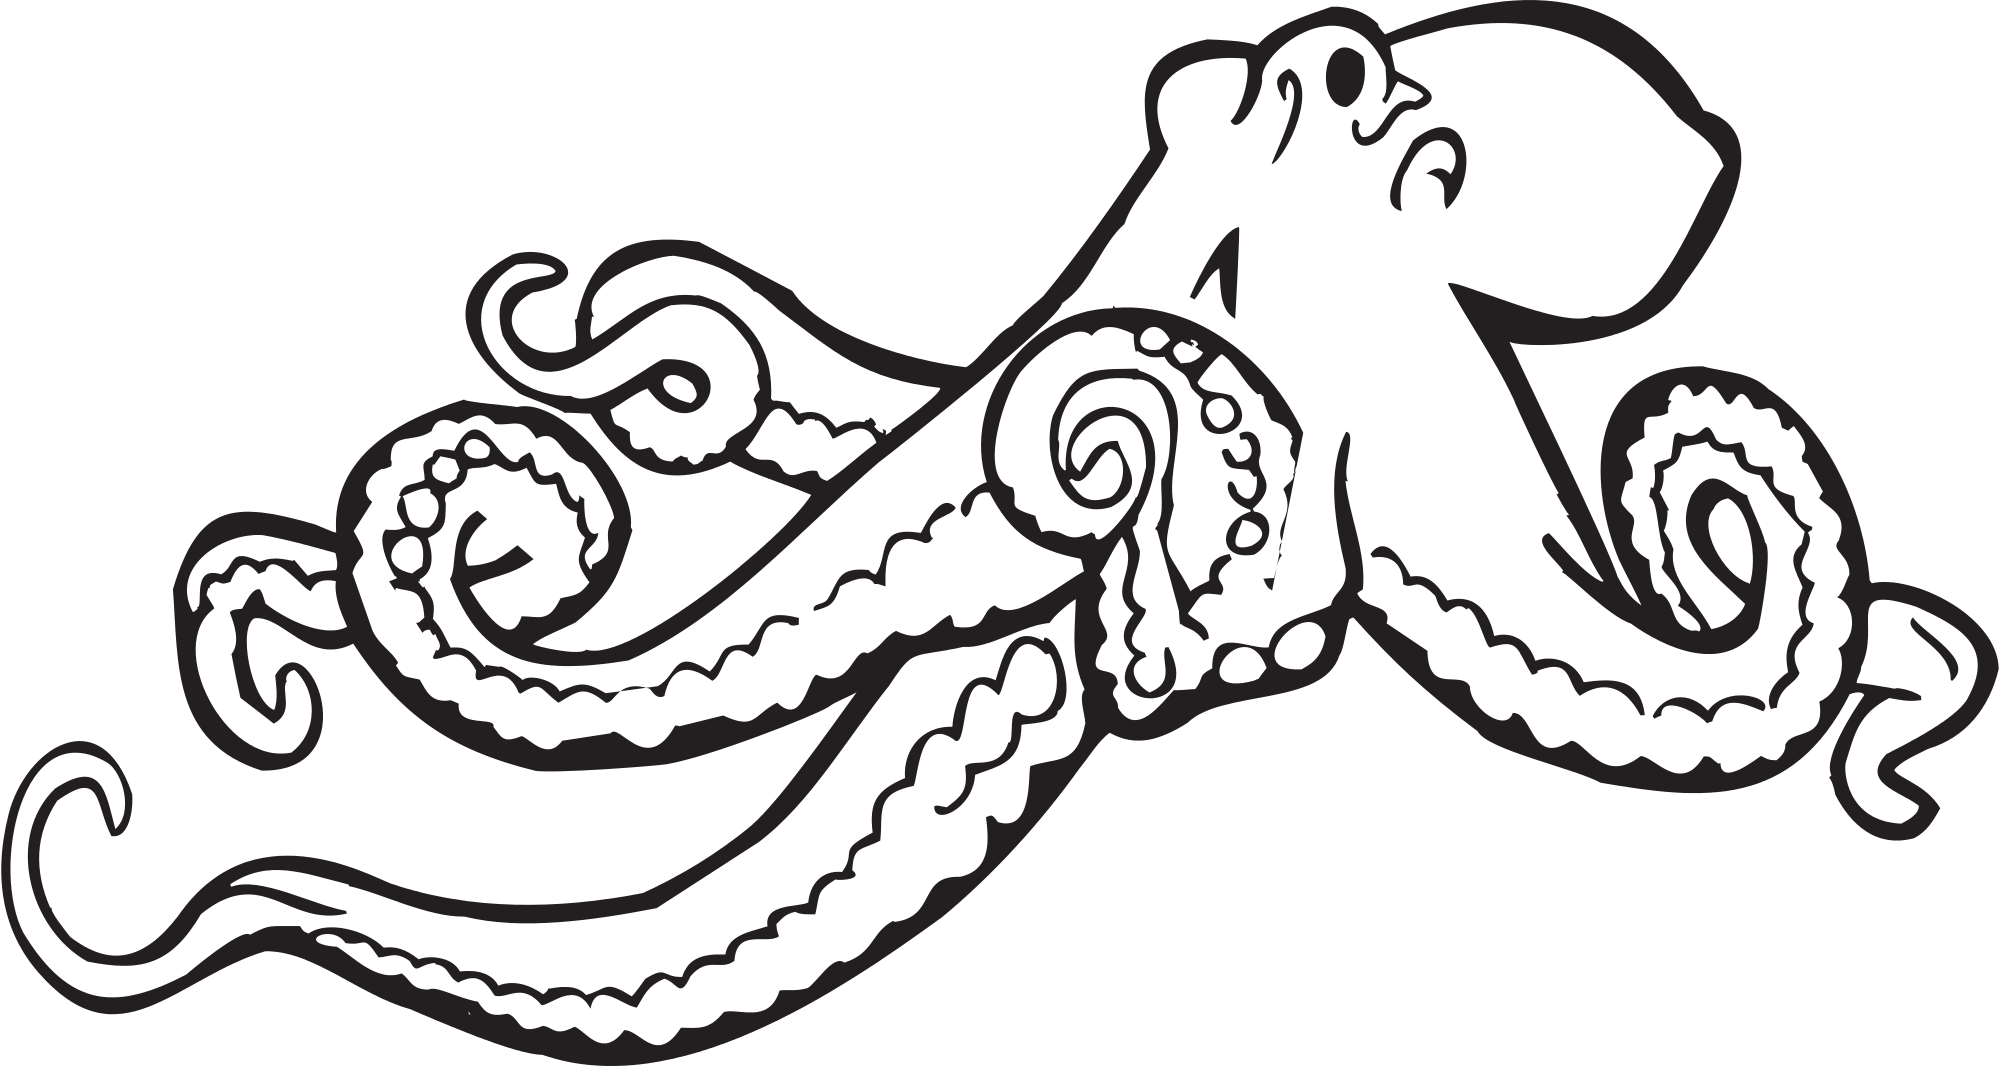 2000x1066 Octopus Clipart Illustrations 2 Octopus Clip Art Vector Image 2